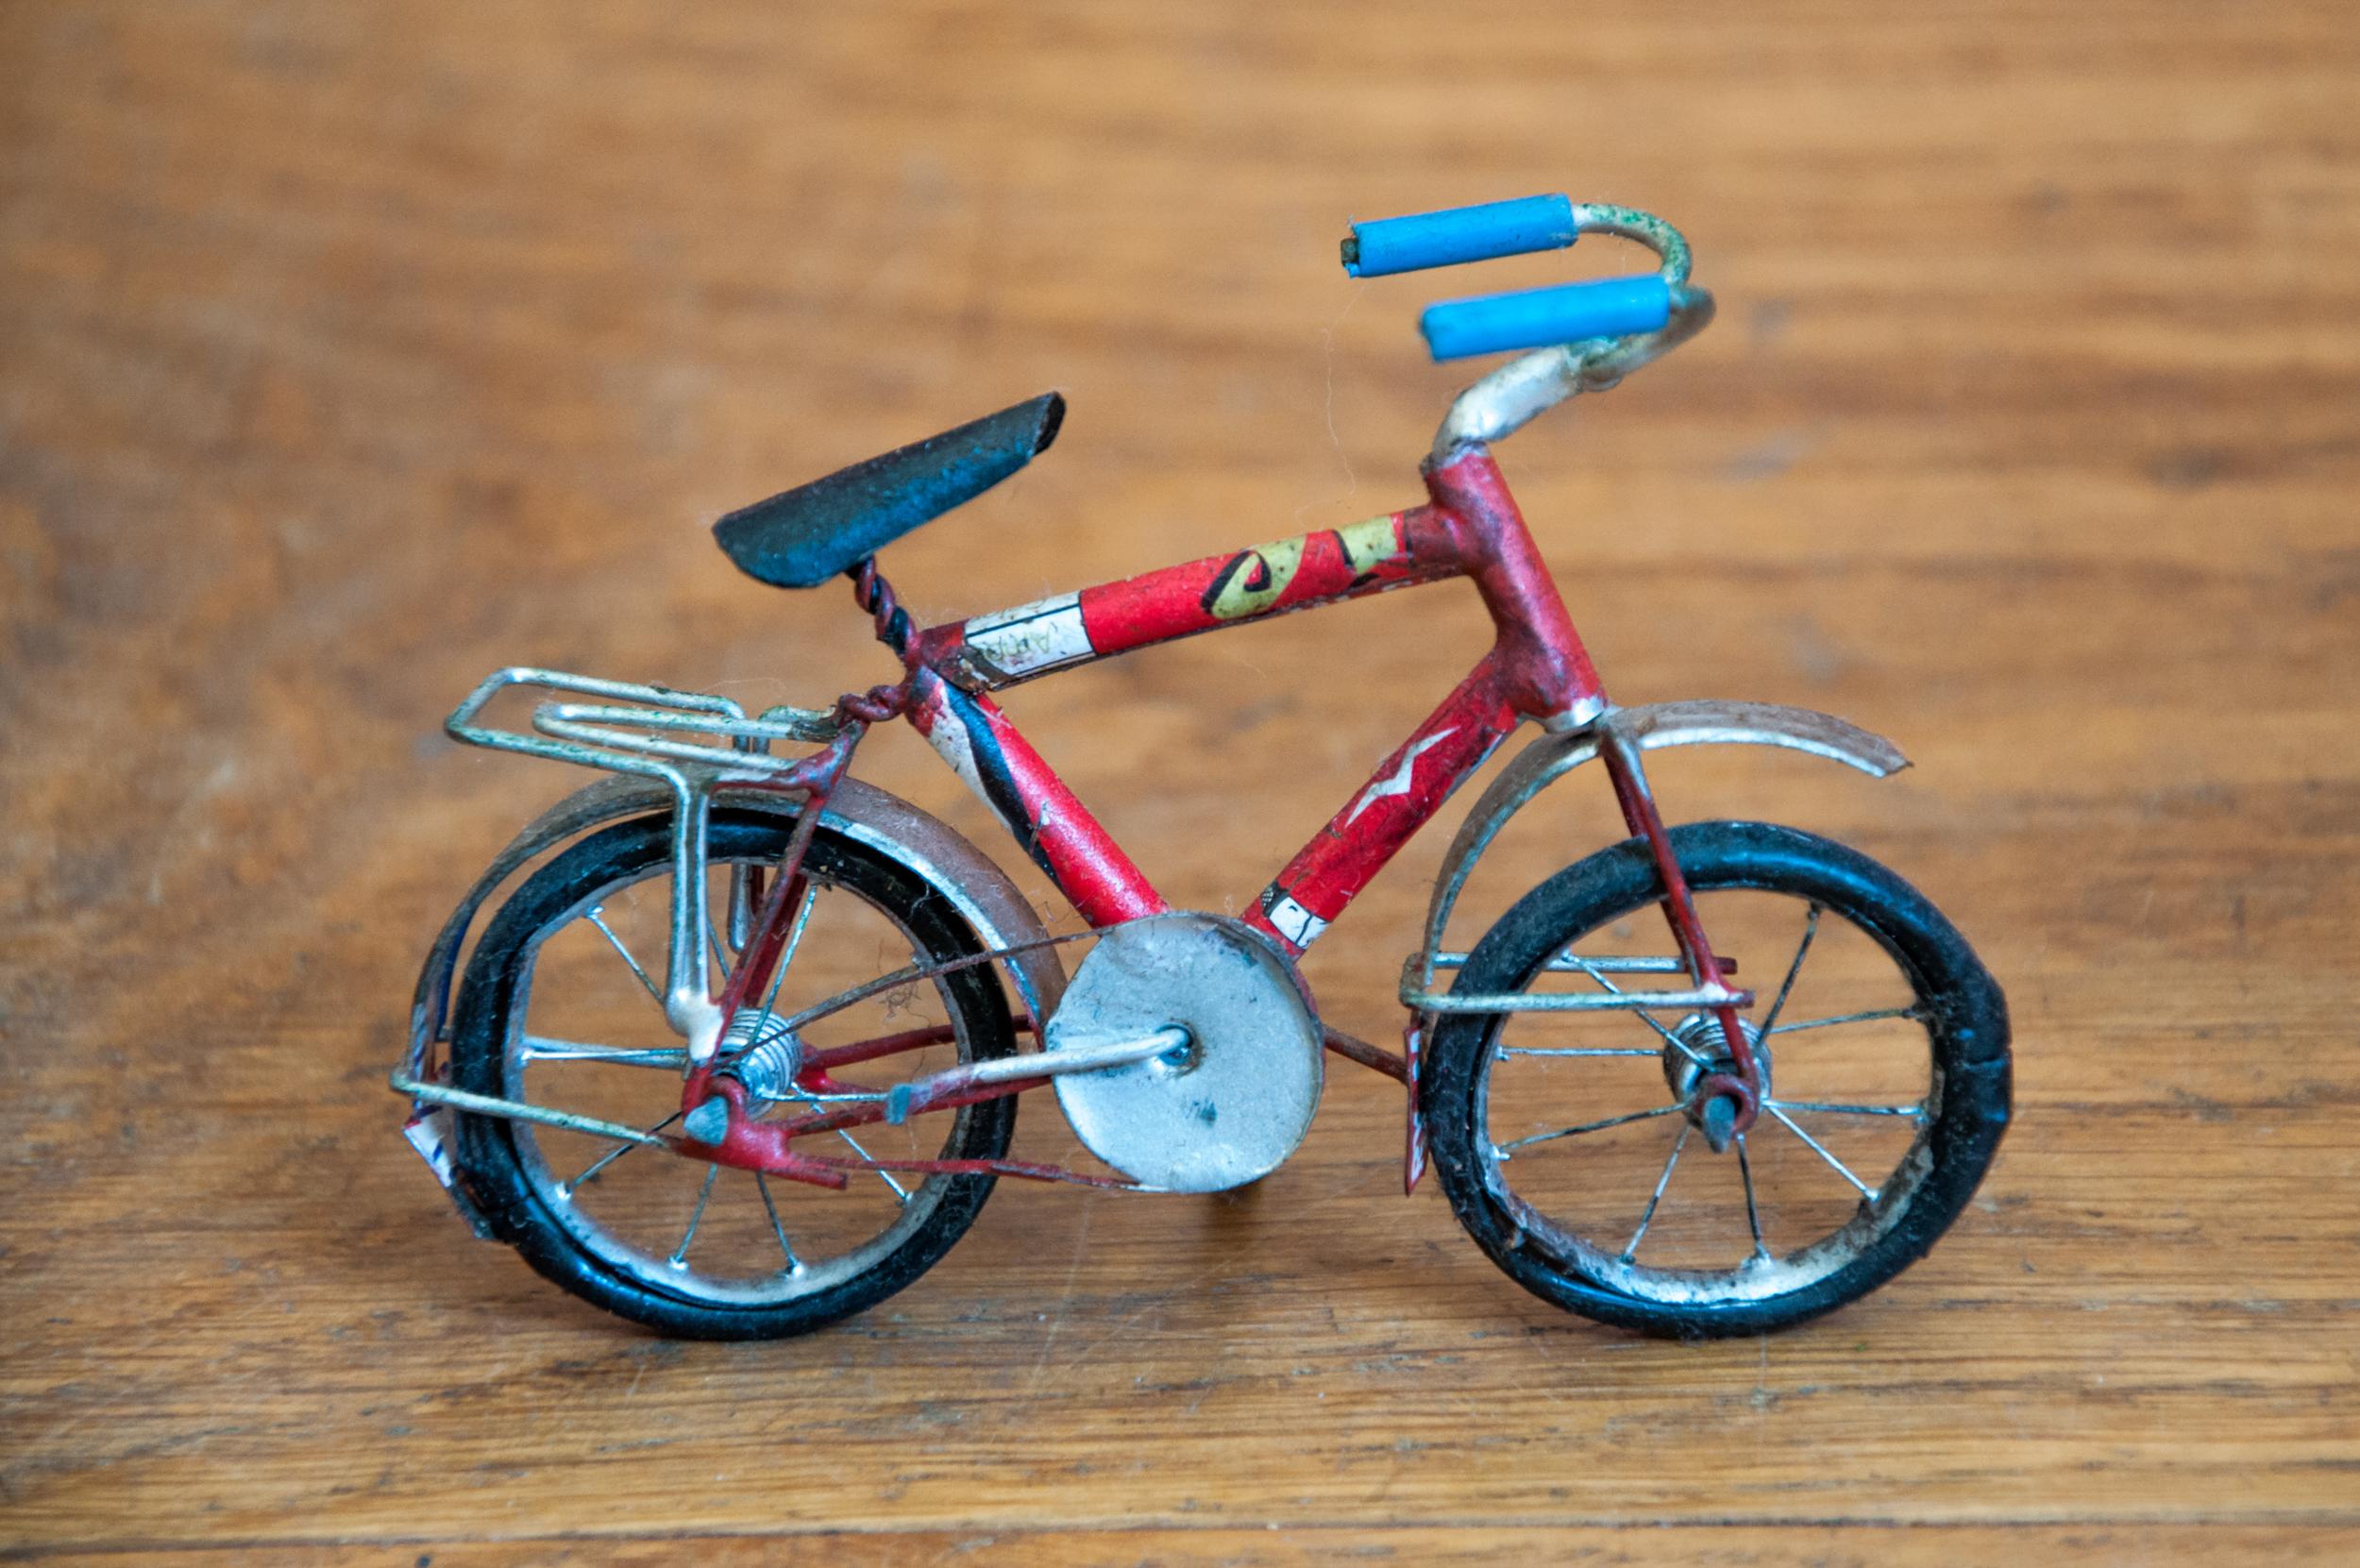 Craft bicycle made by aluminium, Art, Model, White, Vehicle, HQ Photo